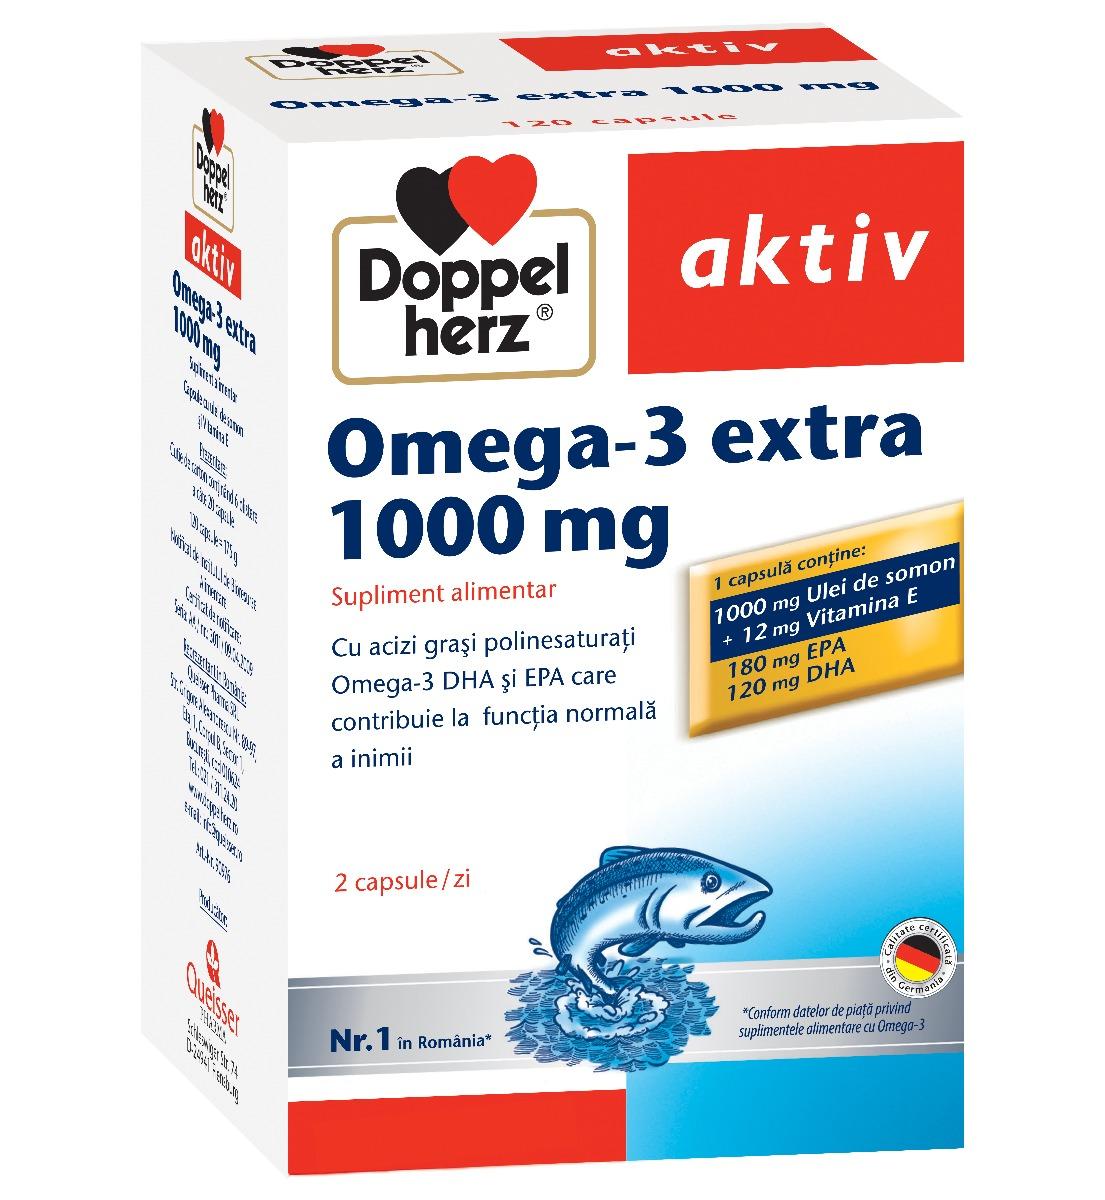 Omega 3 extra 1000 mg, 120 capsule, Doppelherz drmax poza